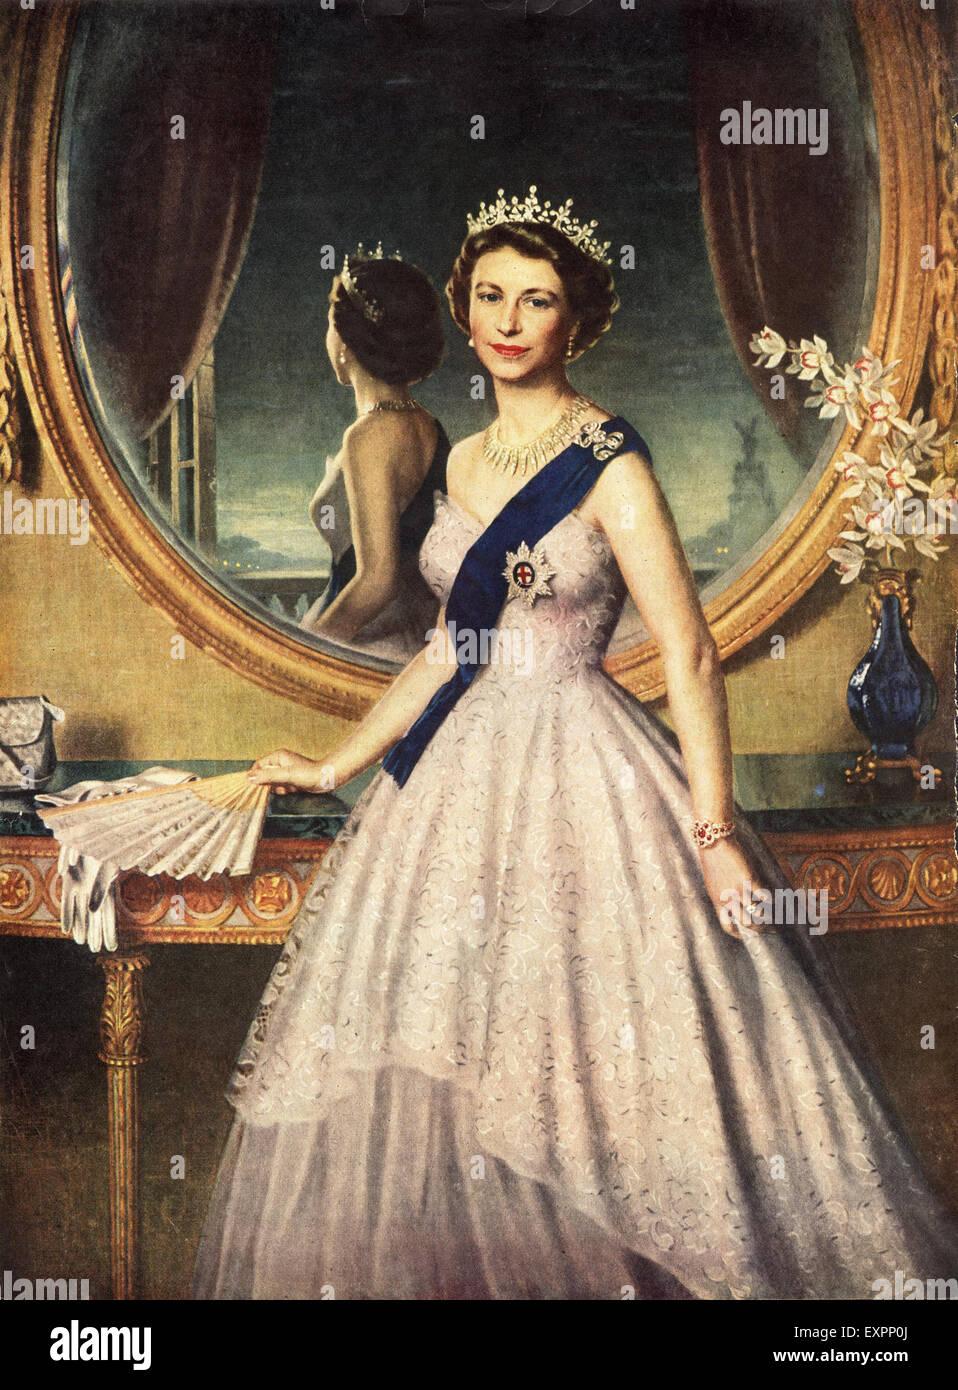 1950s UK Royalty Queen Elizabeth Magazine Cover Stock Photo